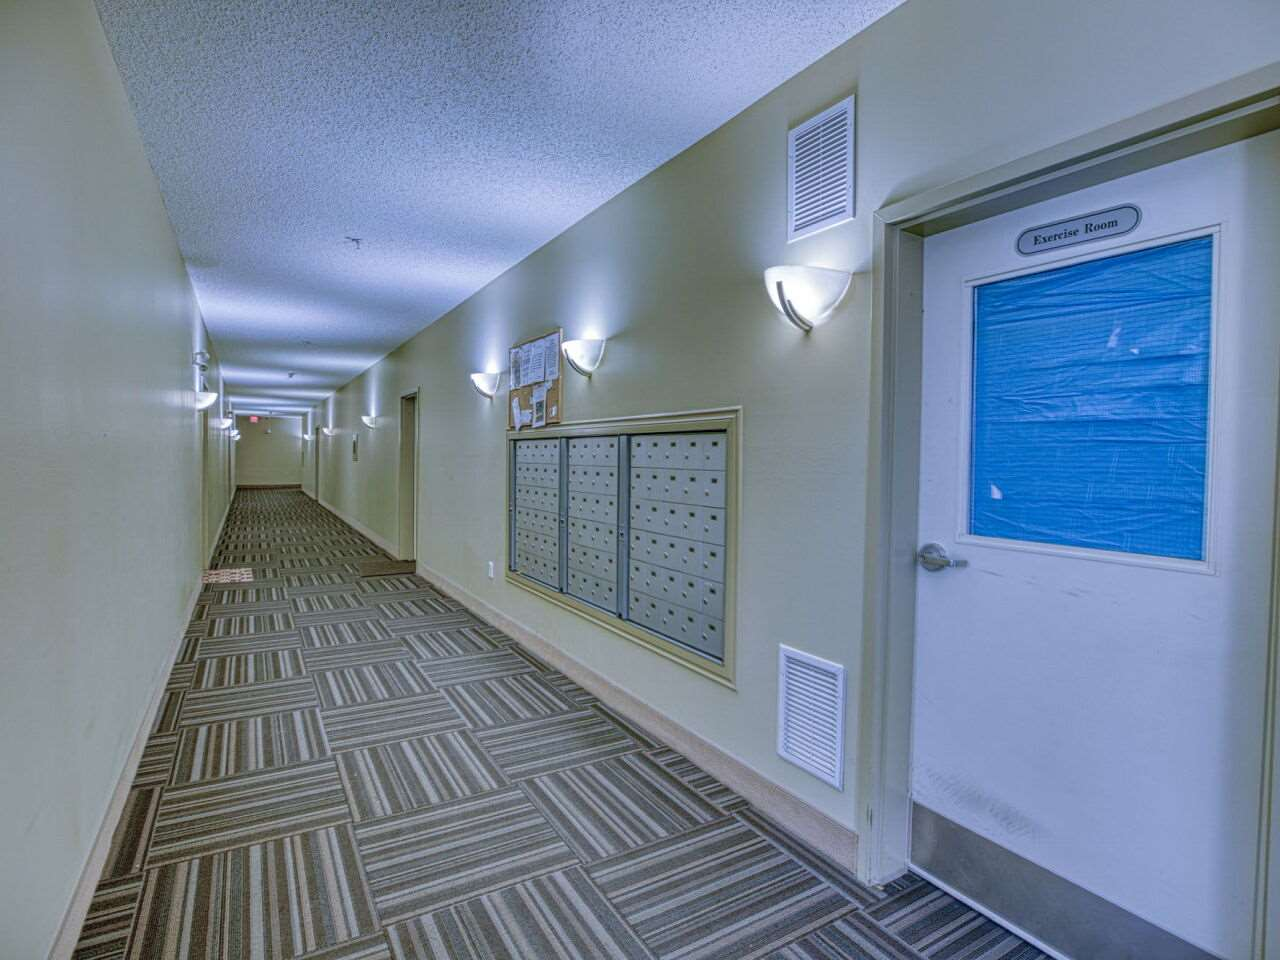 429 16807 100 Avenue - Glenwood_EDMO Lowrise Apartment for sale, 2 Bedrooms (E4234341) #6